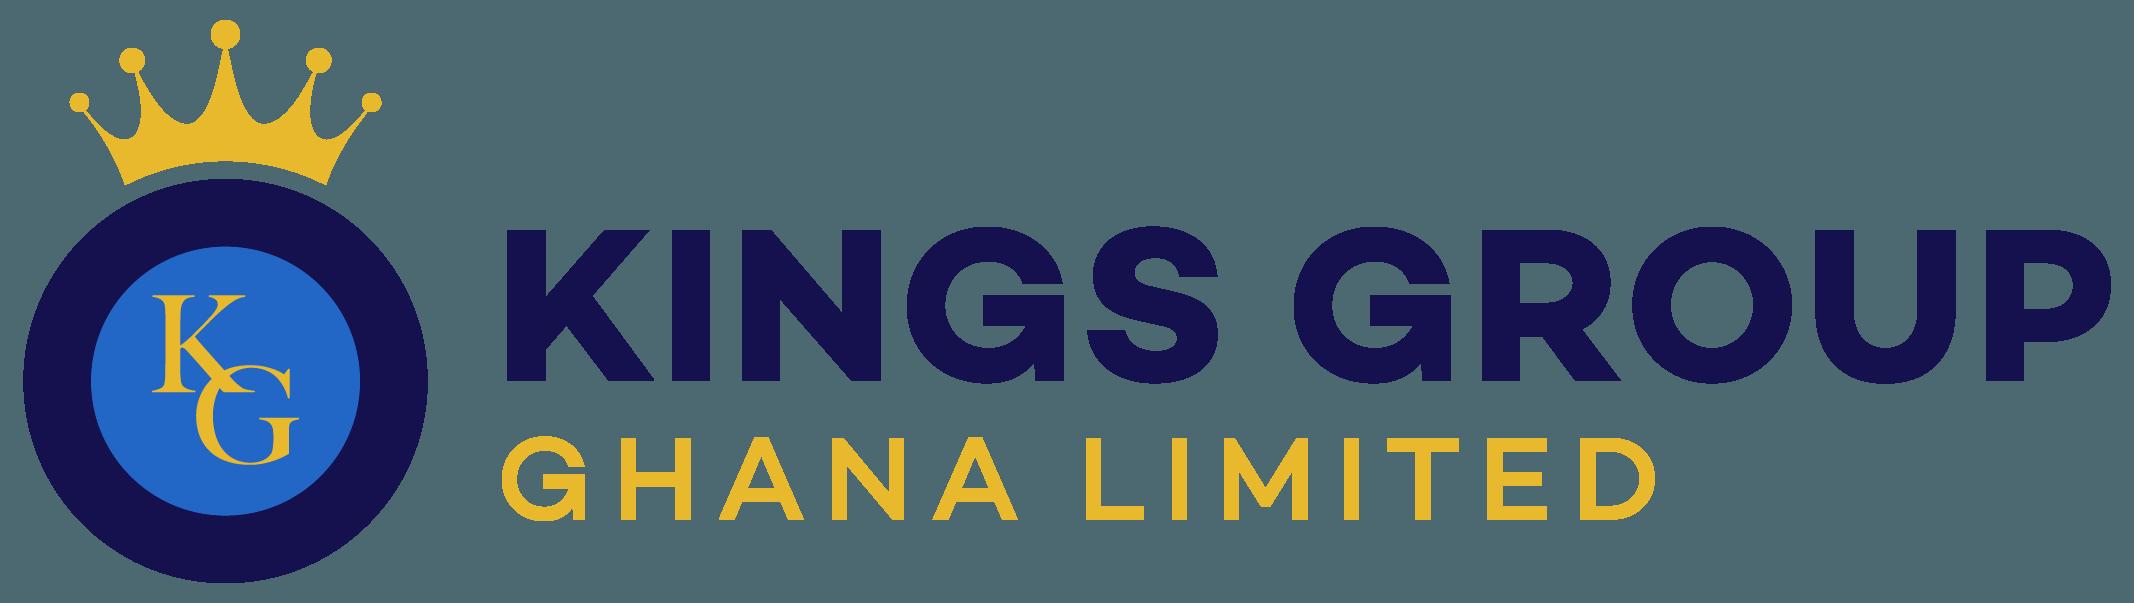 www.kingsgroup.com.gh